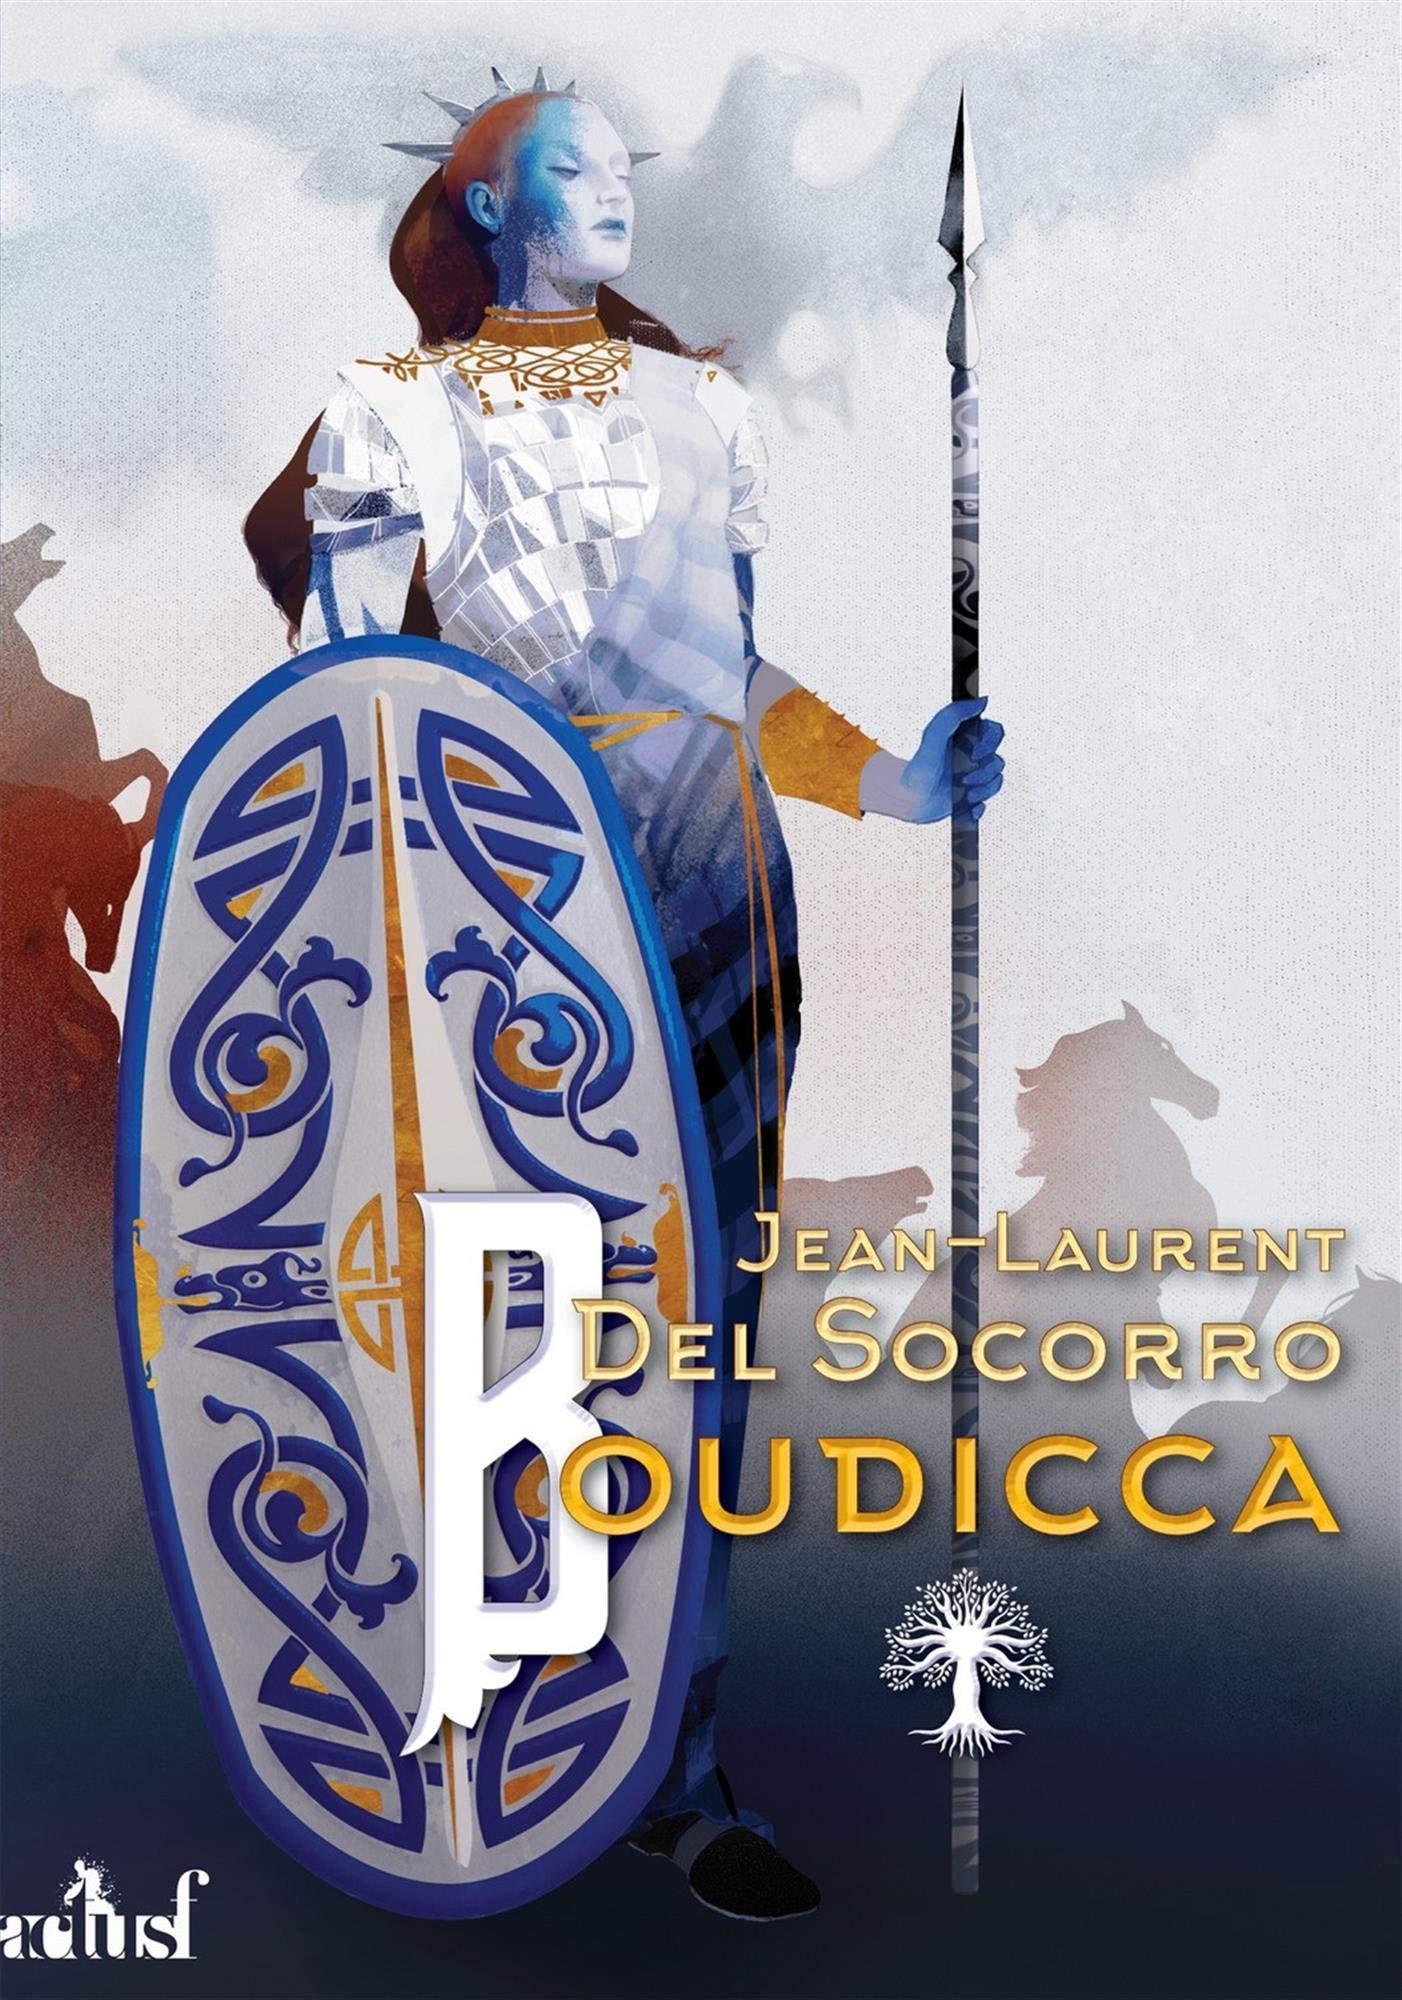 Amazon.fr - Boudicca - Del Socorro, Jean-Laurent - Livres